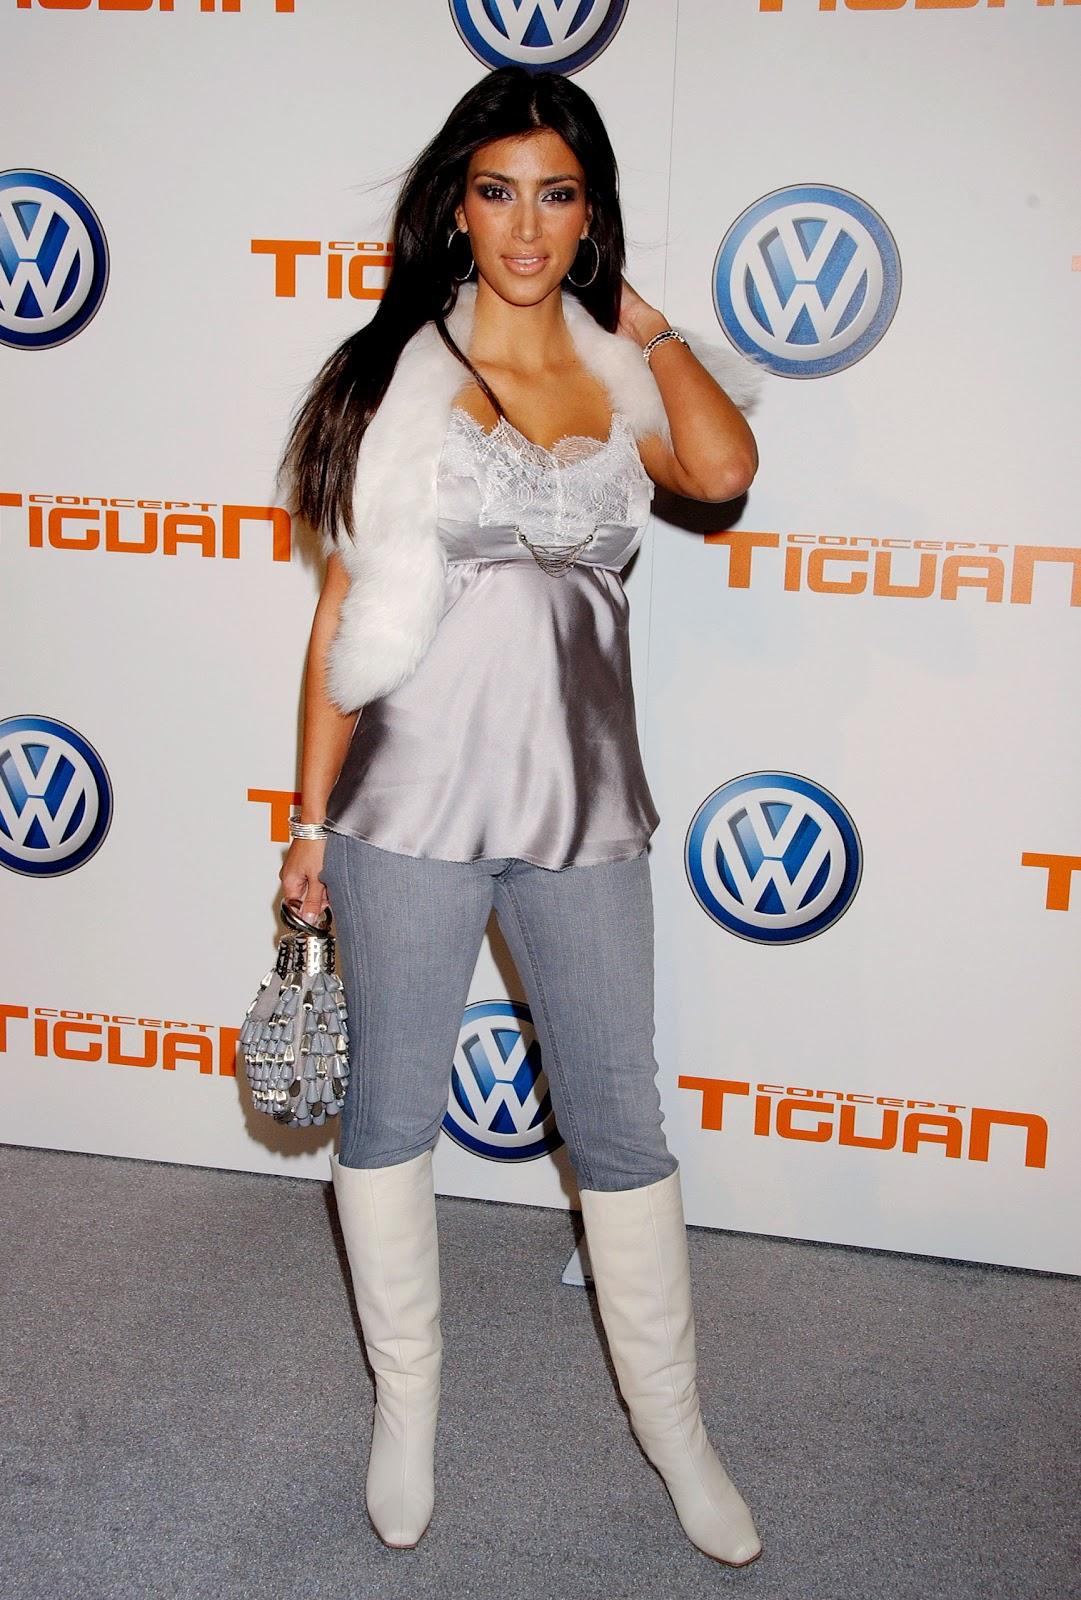 http://1.bp.blogspot.com/_LRzFEyAOGAA/TQnLHnW3WWI/AAAAAAAADz0/F1hBx1o6U1I/s1600/33182_HQCB.net_Kim_Kardashian_02_123_544lo.jpg